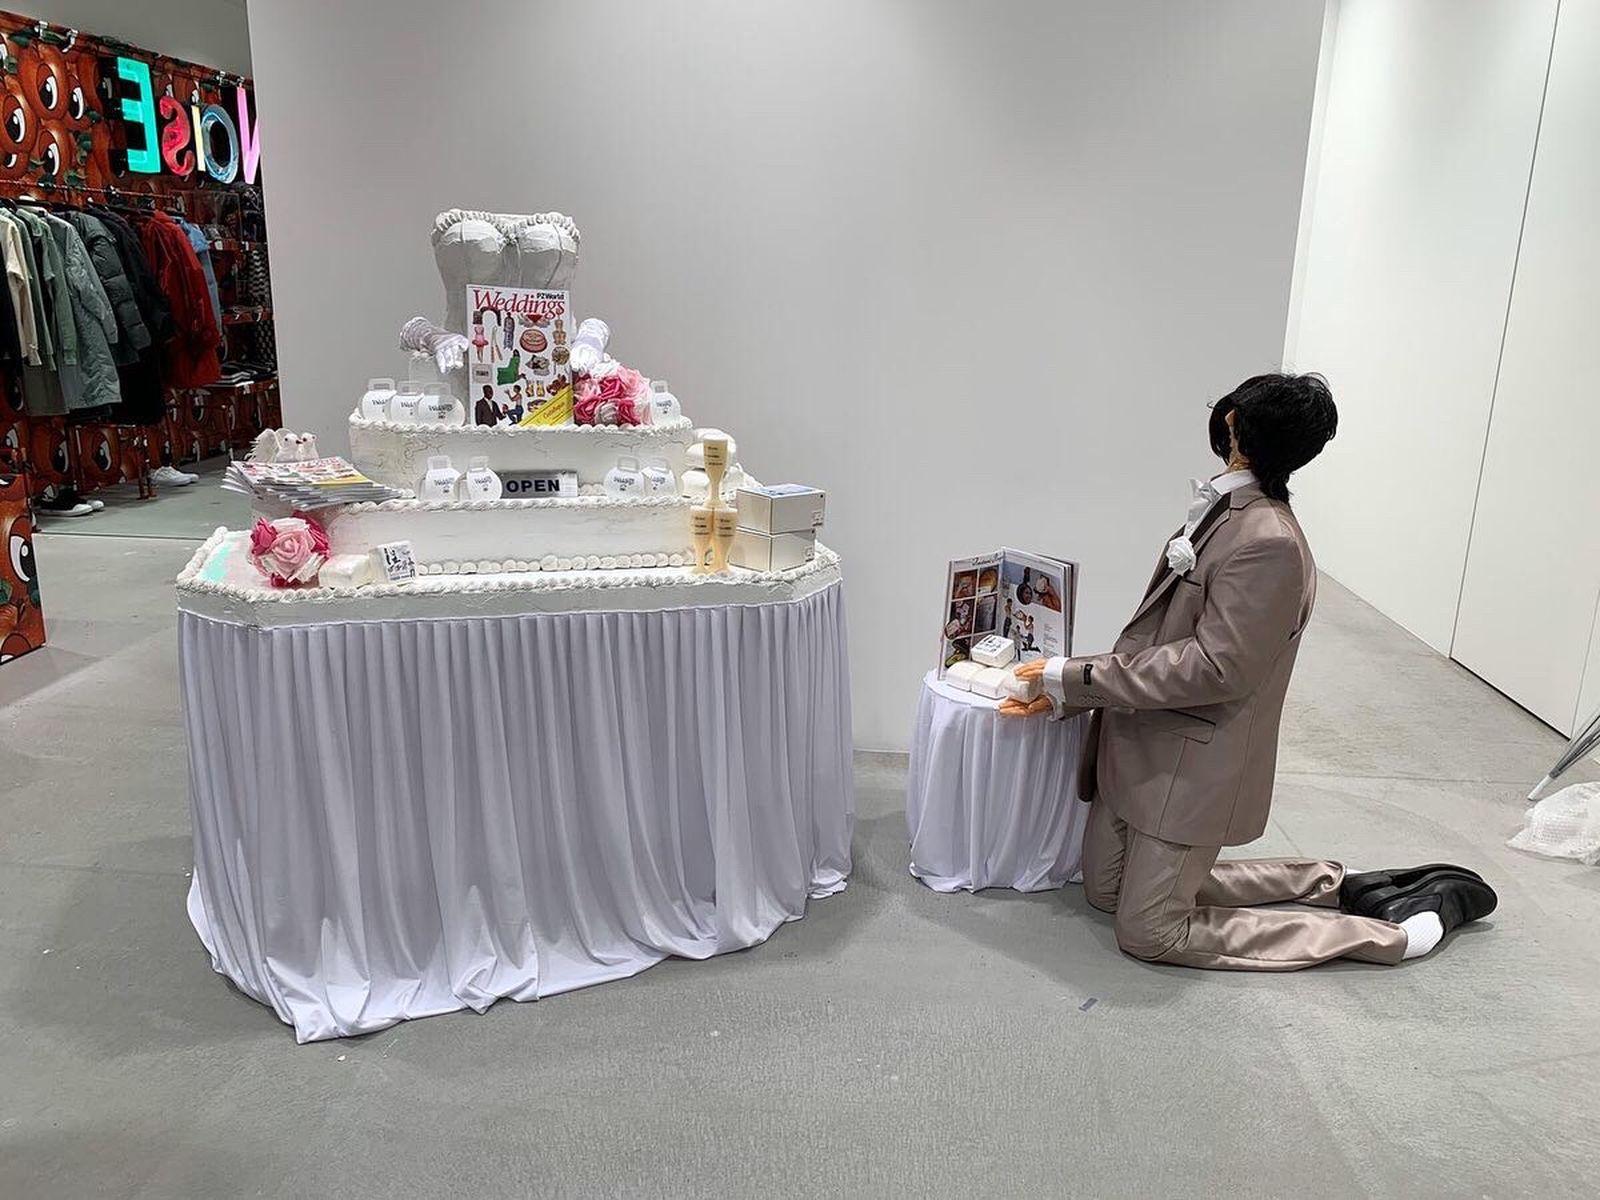 designer-pz-opassuksatit-weddings-love-working-vetements-01